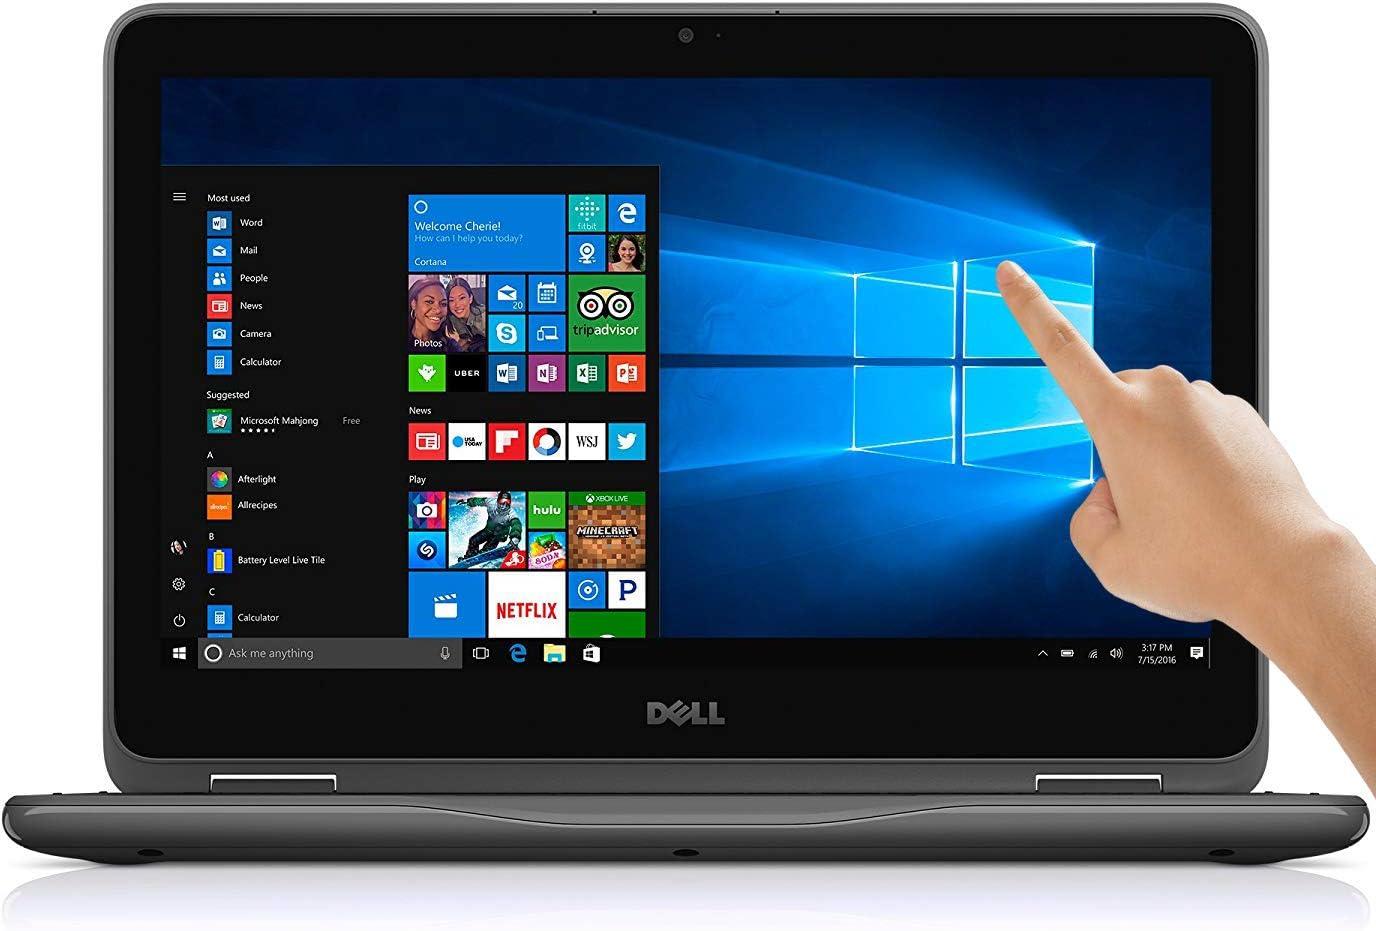 Dell Inspiron 11.6 inch Touchscreen 360 Convertible 2 in 1 Laptop, 11.6 HD (1366 x 768) Display, AMD A9-9420e 2.6GHz, 4GB DDR4 RAM, 500GB HDD, AMD APU, Windows 10